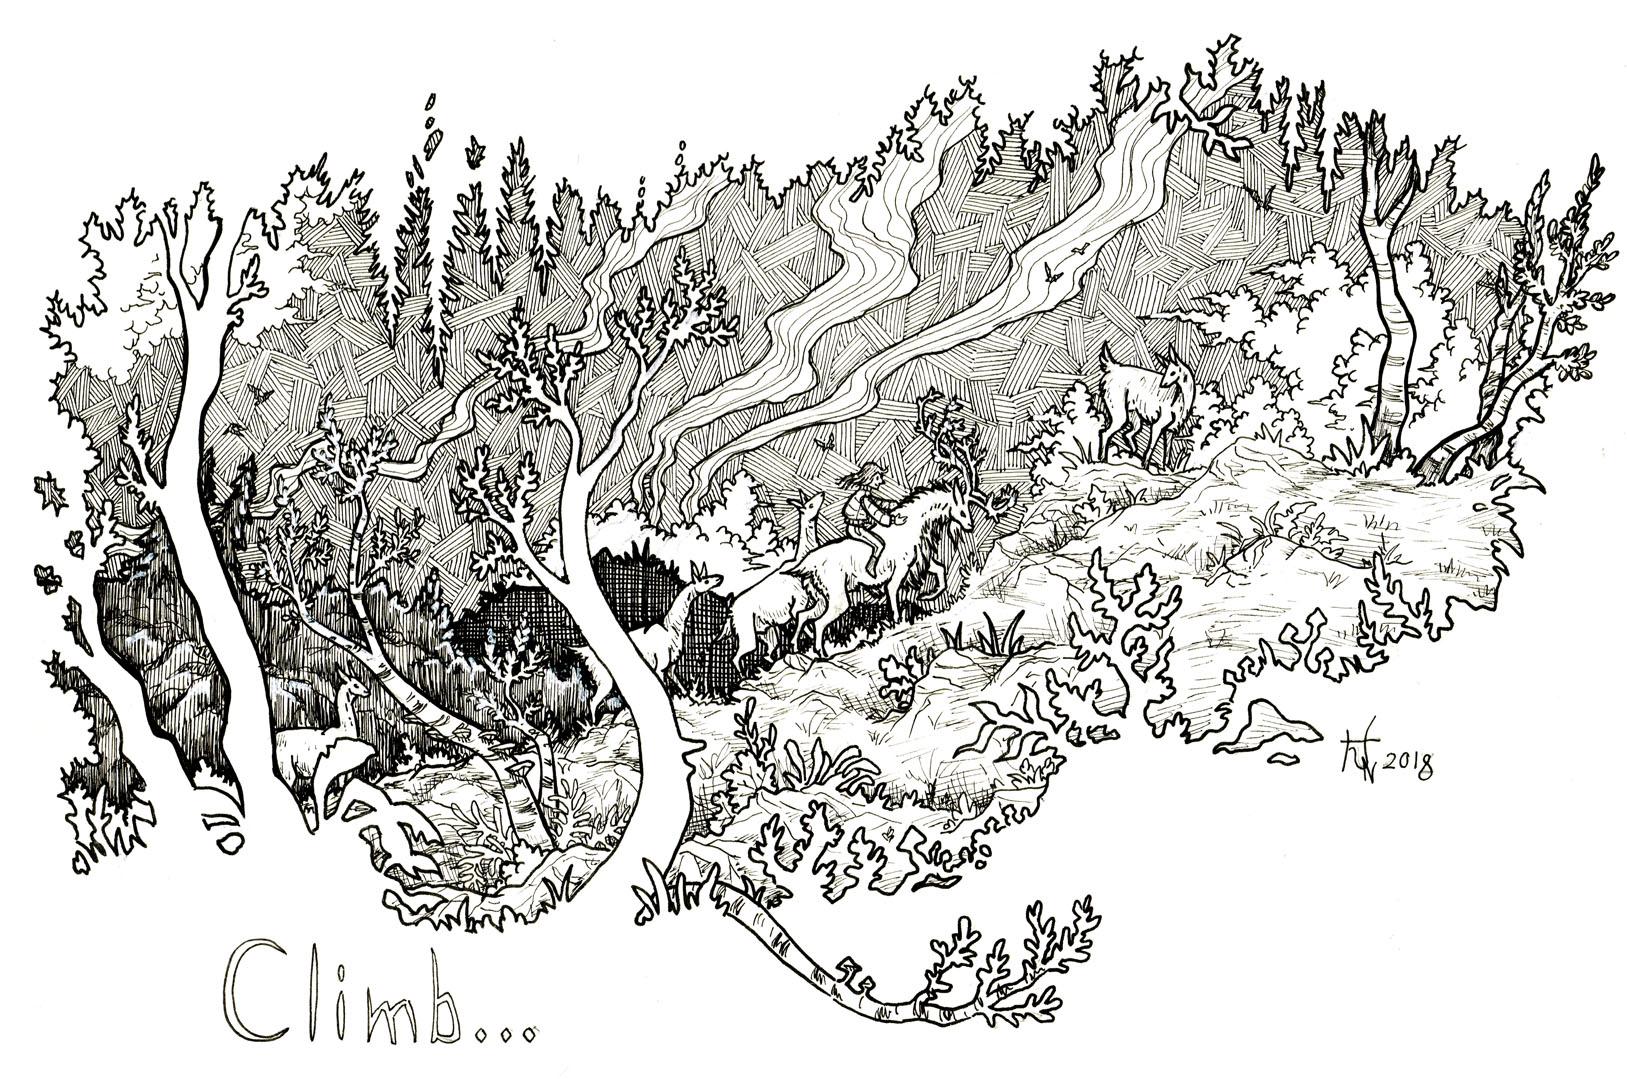 climb1small.jpg